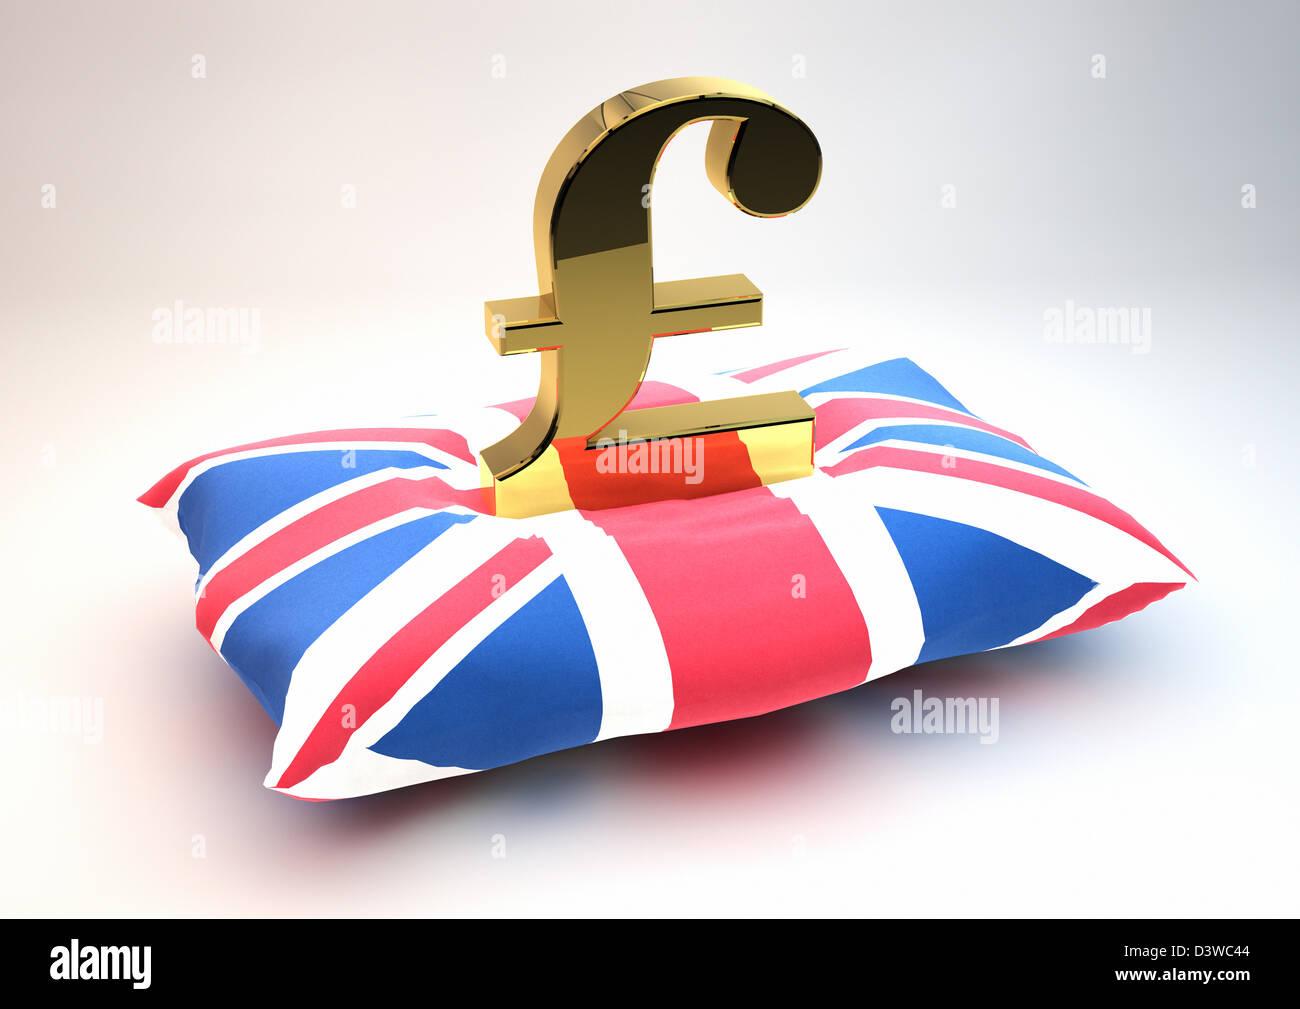 Solid Gold British Pound Symbol Sitting On A Union Jack Flag Stock